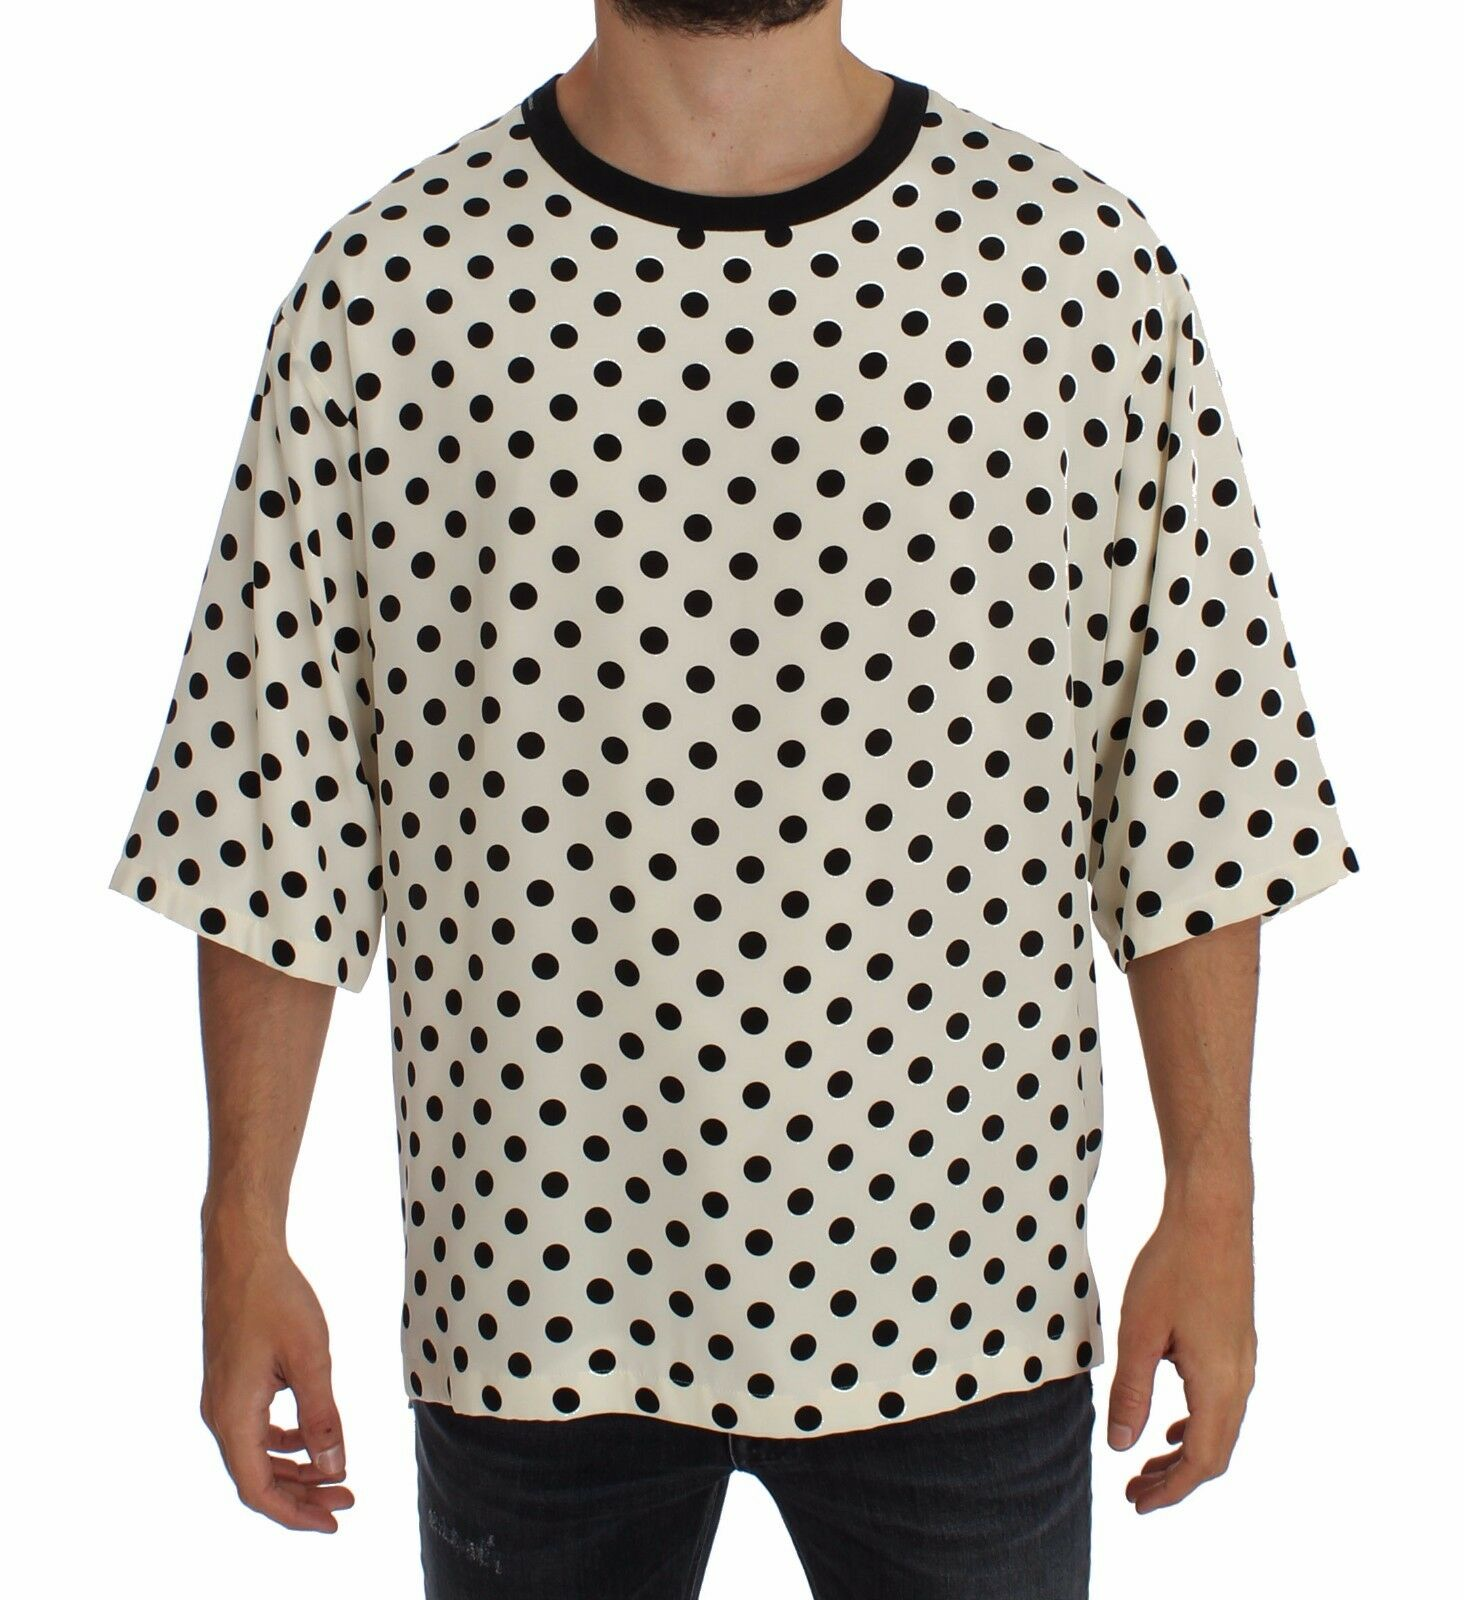 Nuova con Etichetta Dolce & Gabbana Bianco Nero a Pois Seta Girocollo T-Shirt